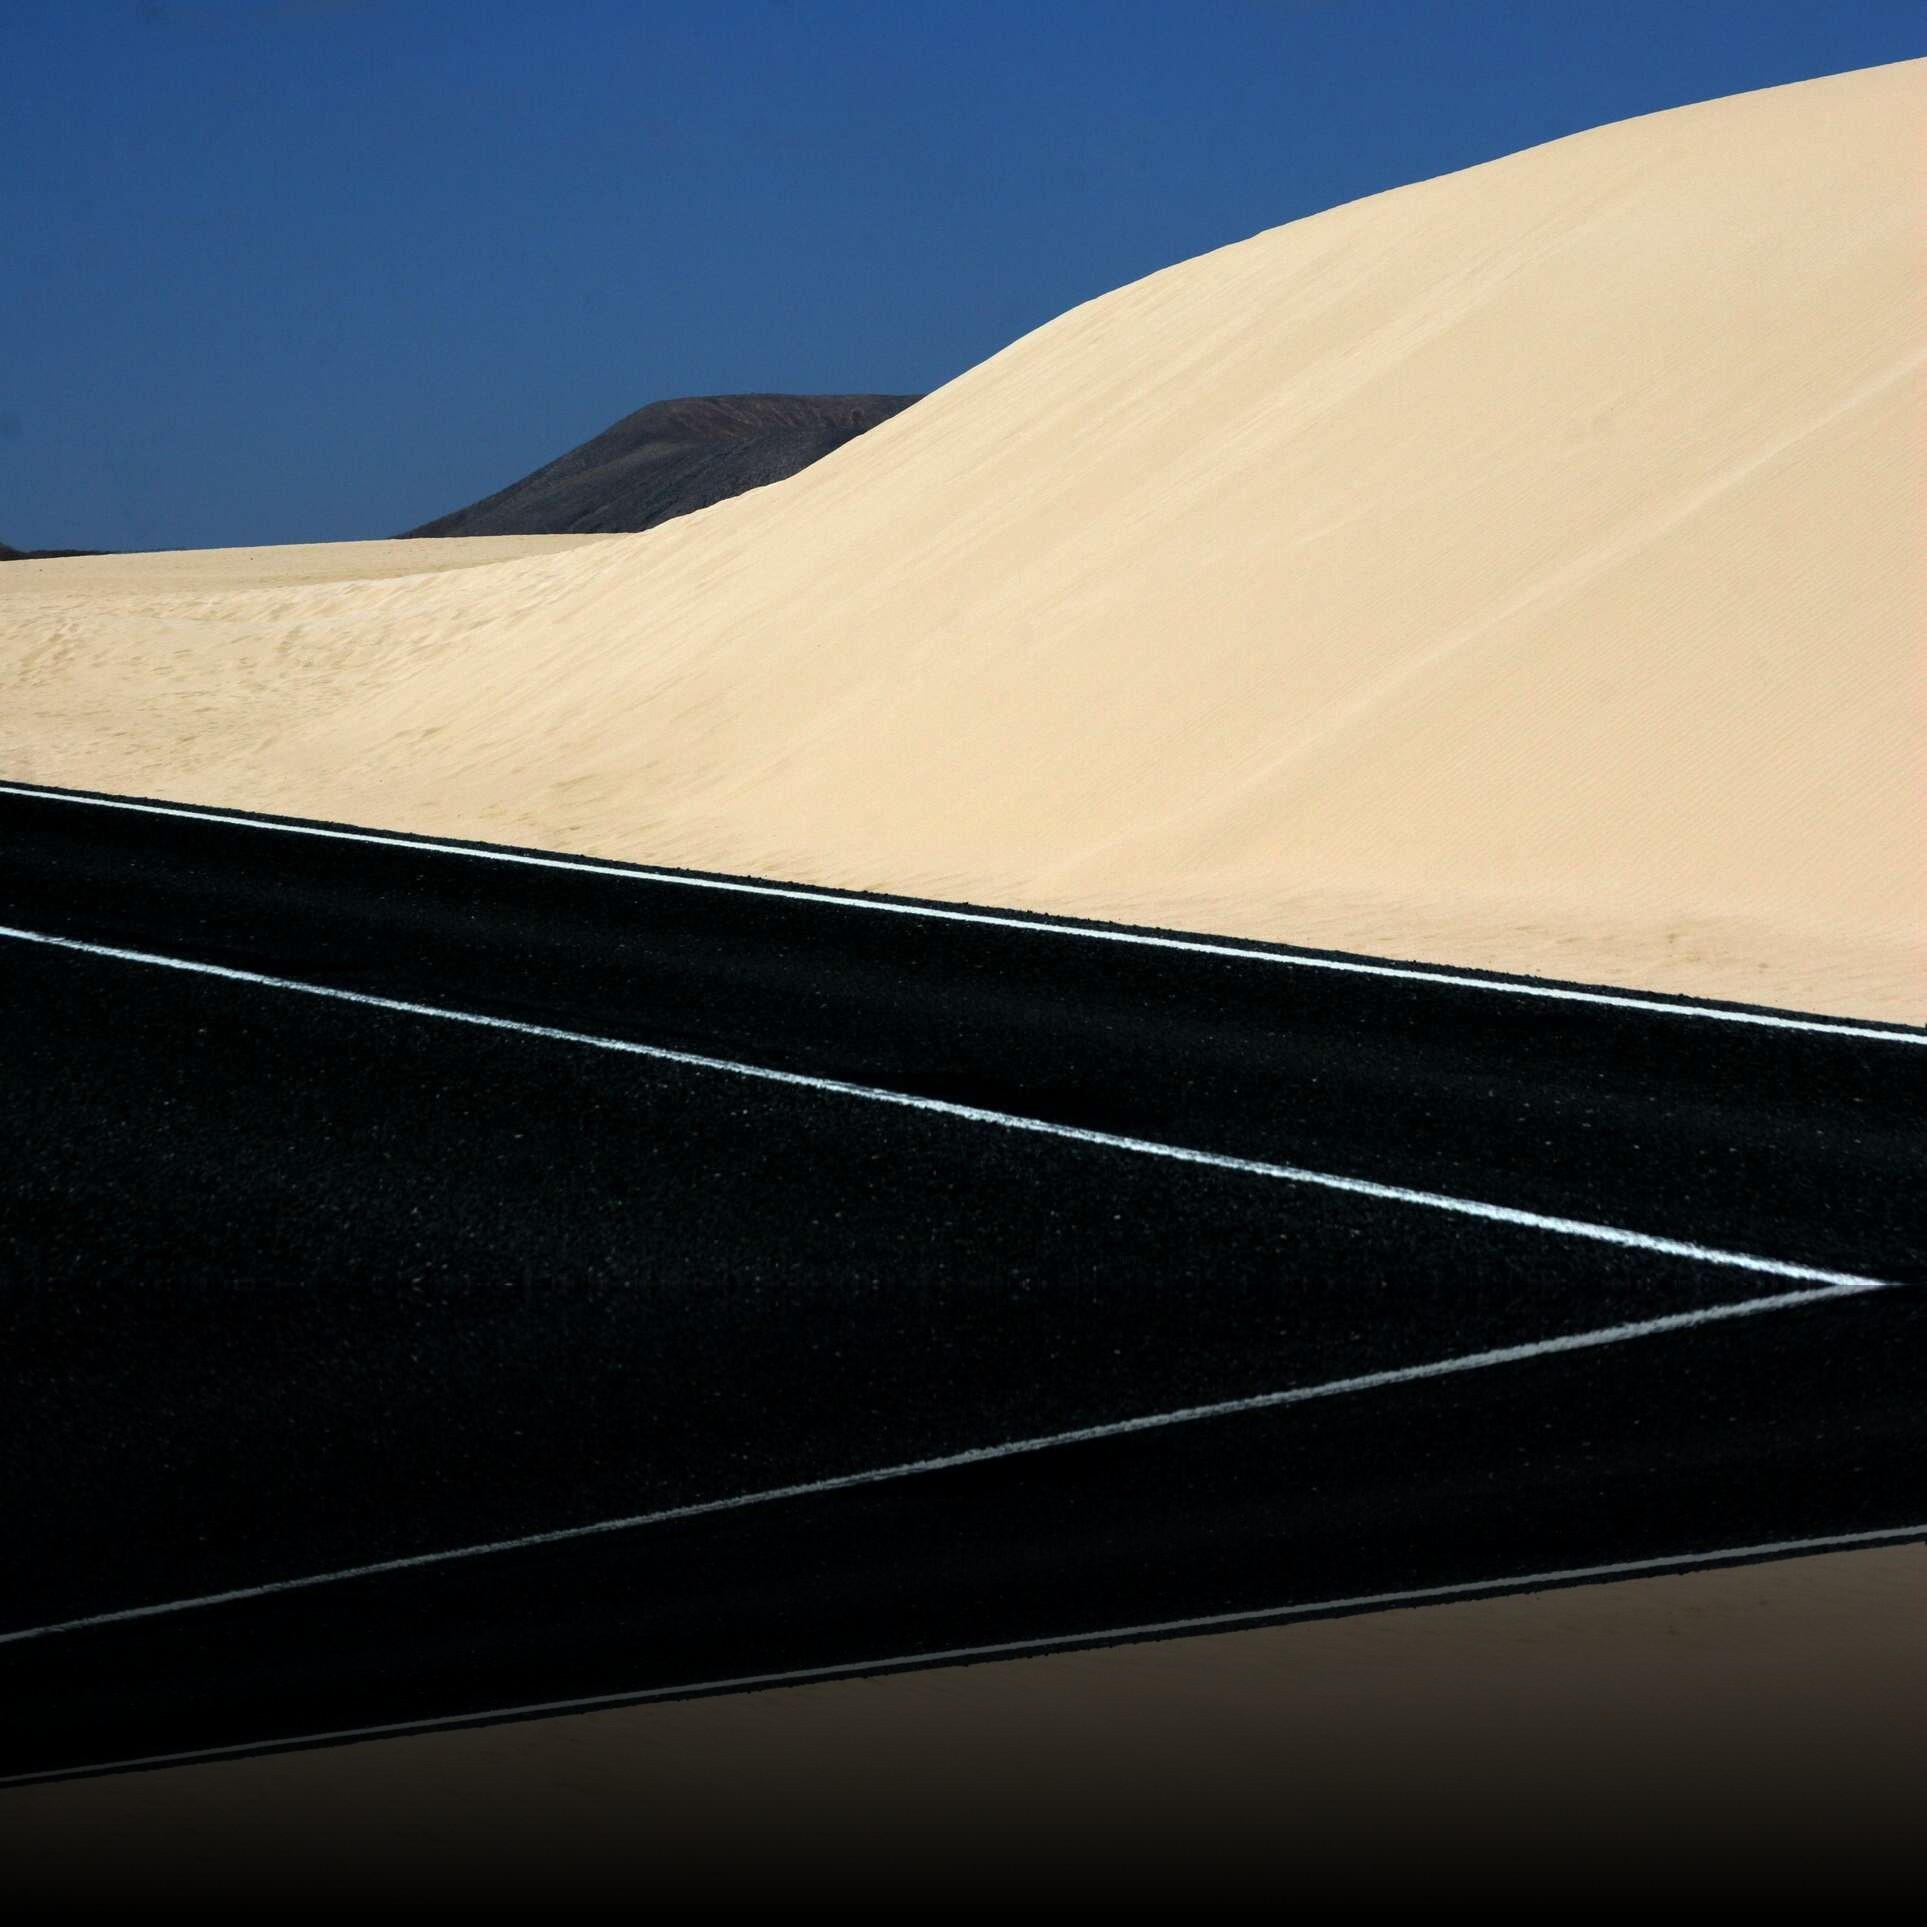 refl_3b9f5c6a365cdd8d125d668c804a7329_1914-sabbia-e-asfalto-2